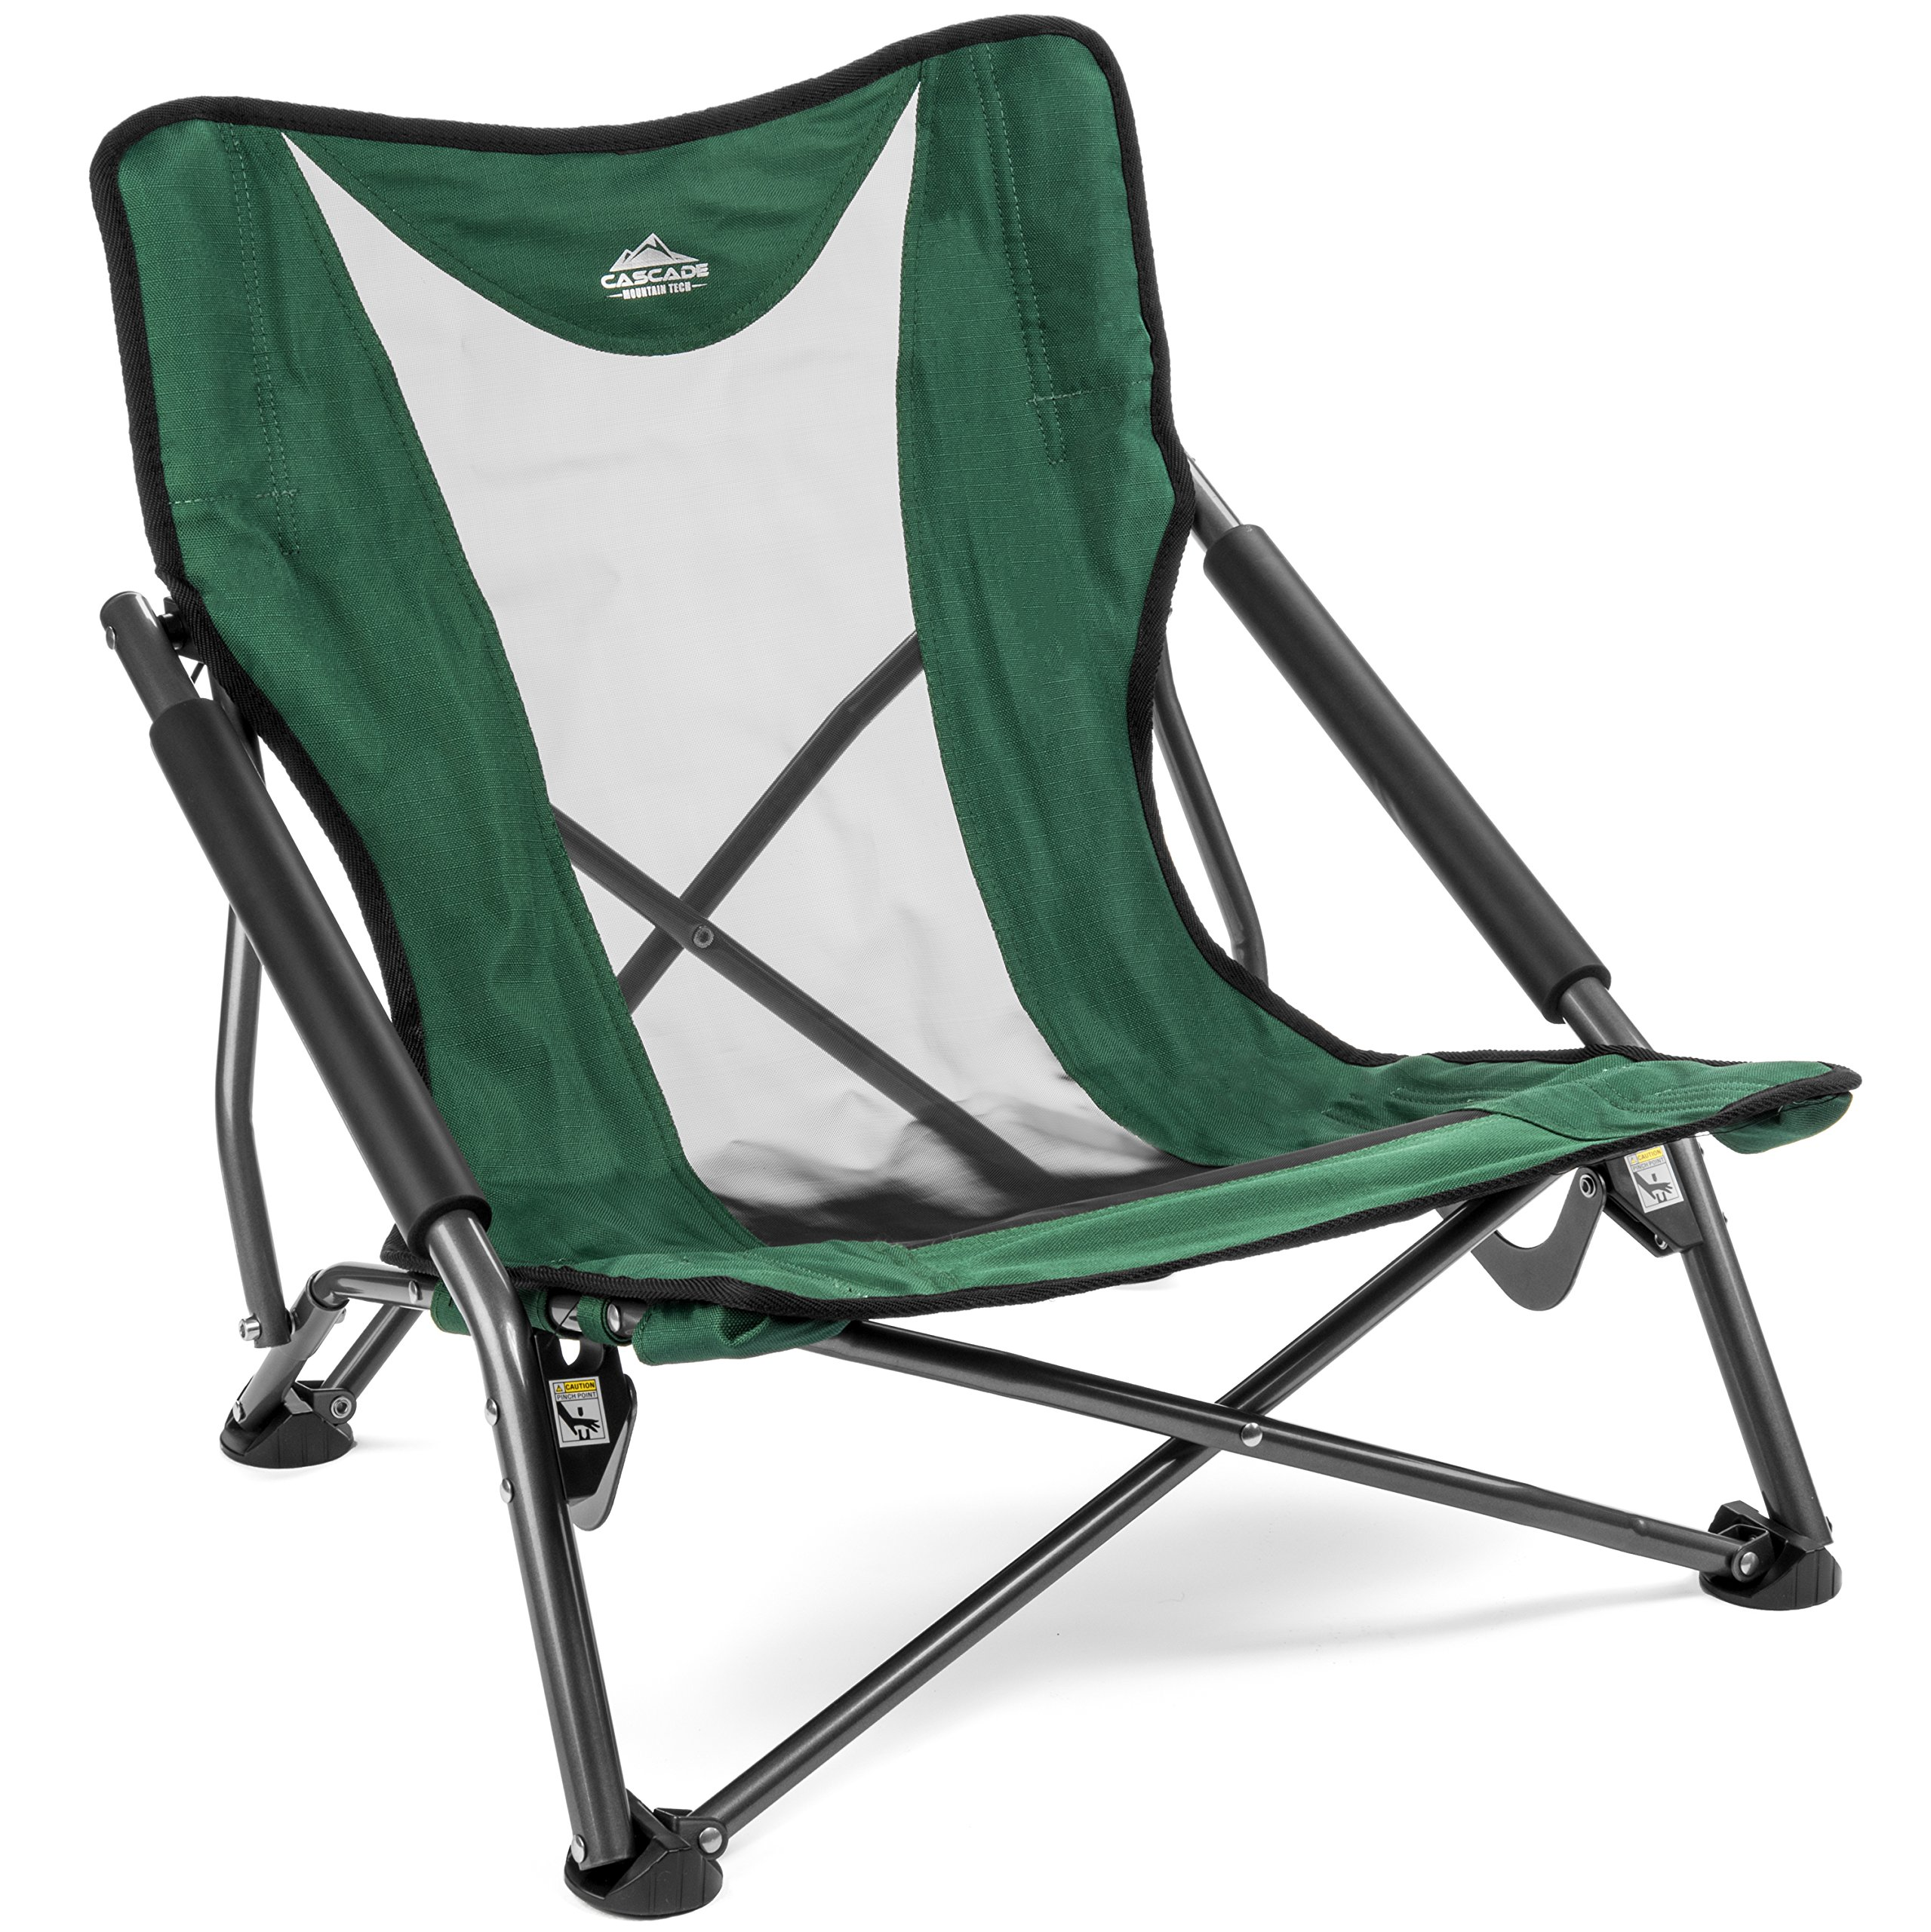 Cascade Mountain Tech Compact Low Profile Beach Outdoor C&ing Concert Chair  sc 1 st  Amazon.com & Best low profile lawn chairs for concerts | Amazon.com